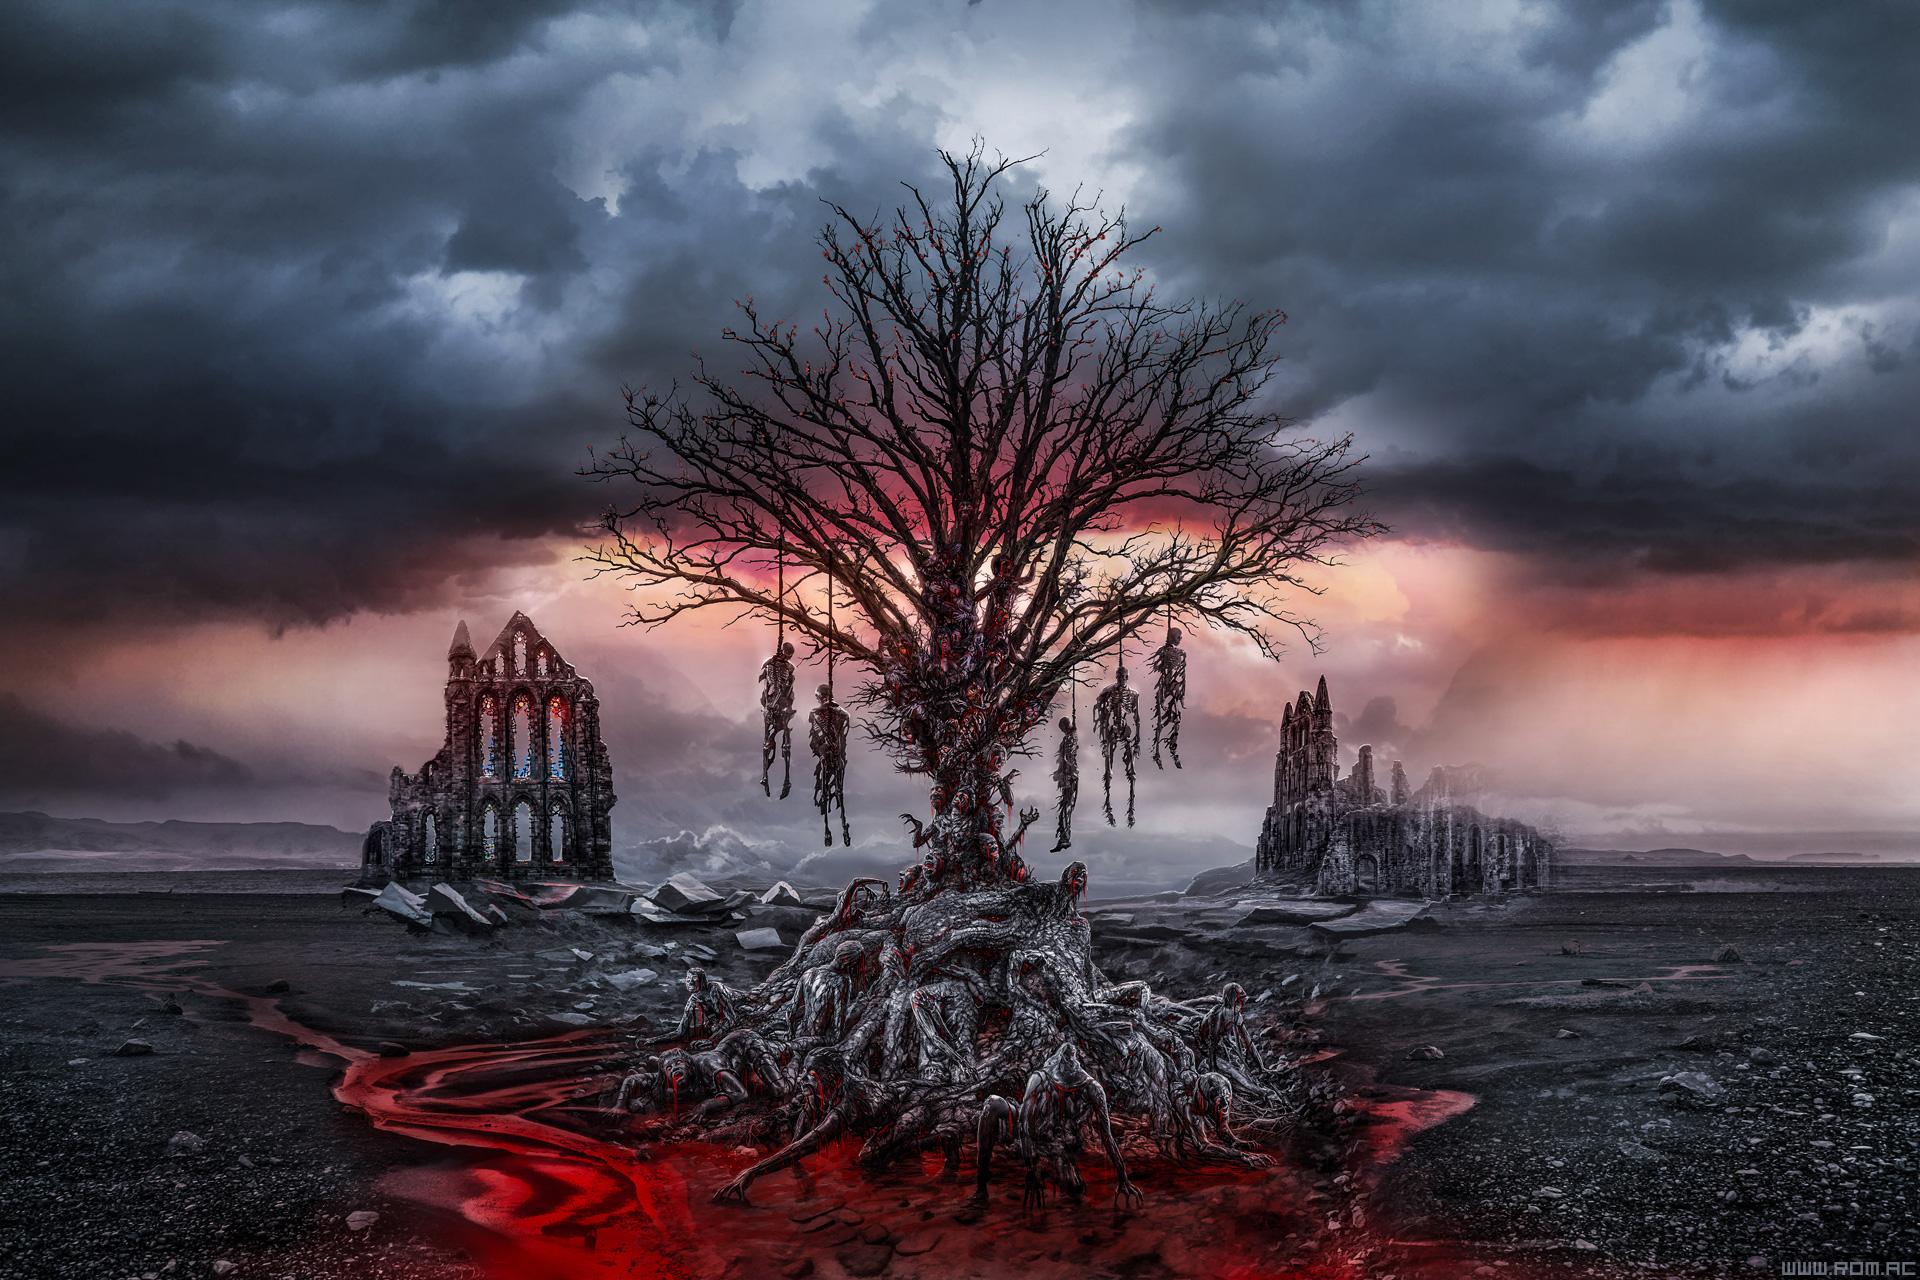 Death tree [CD COVER ART]